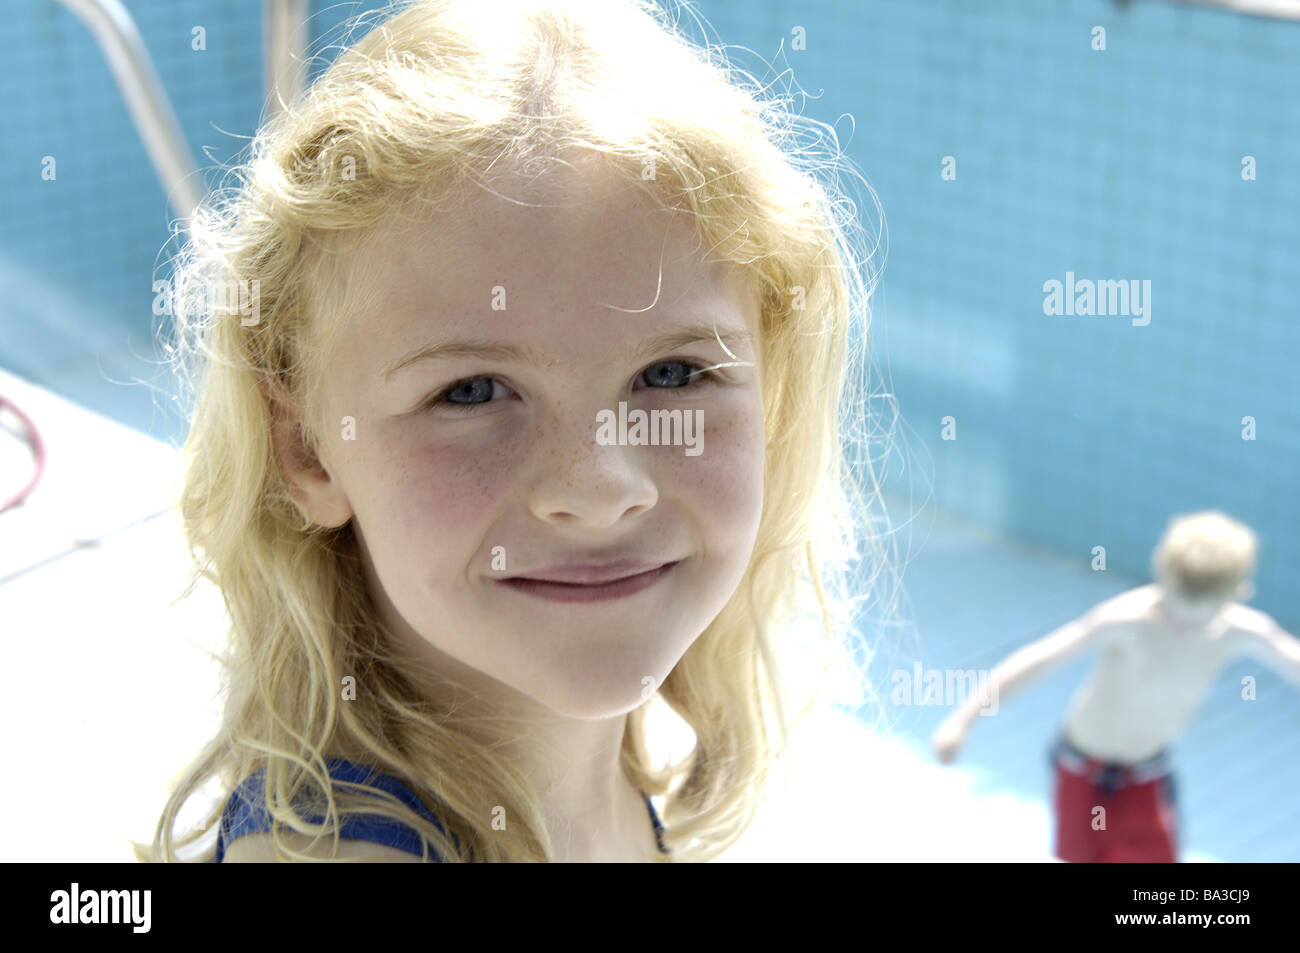 Pool empty children ball-games girls blond portrait series people blond gaze camera smiles naturalness boys bath - Stock Image